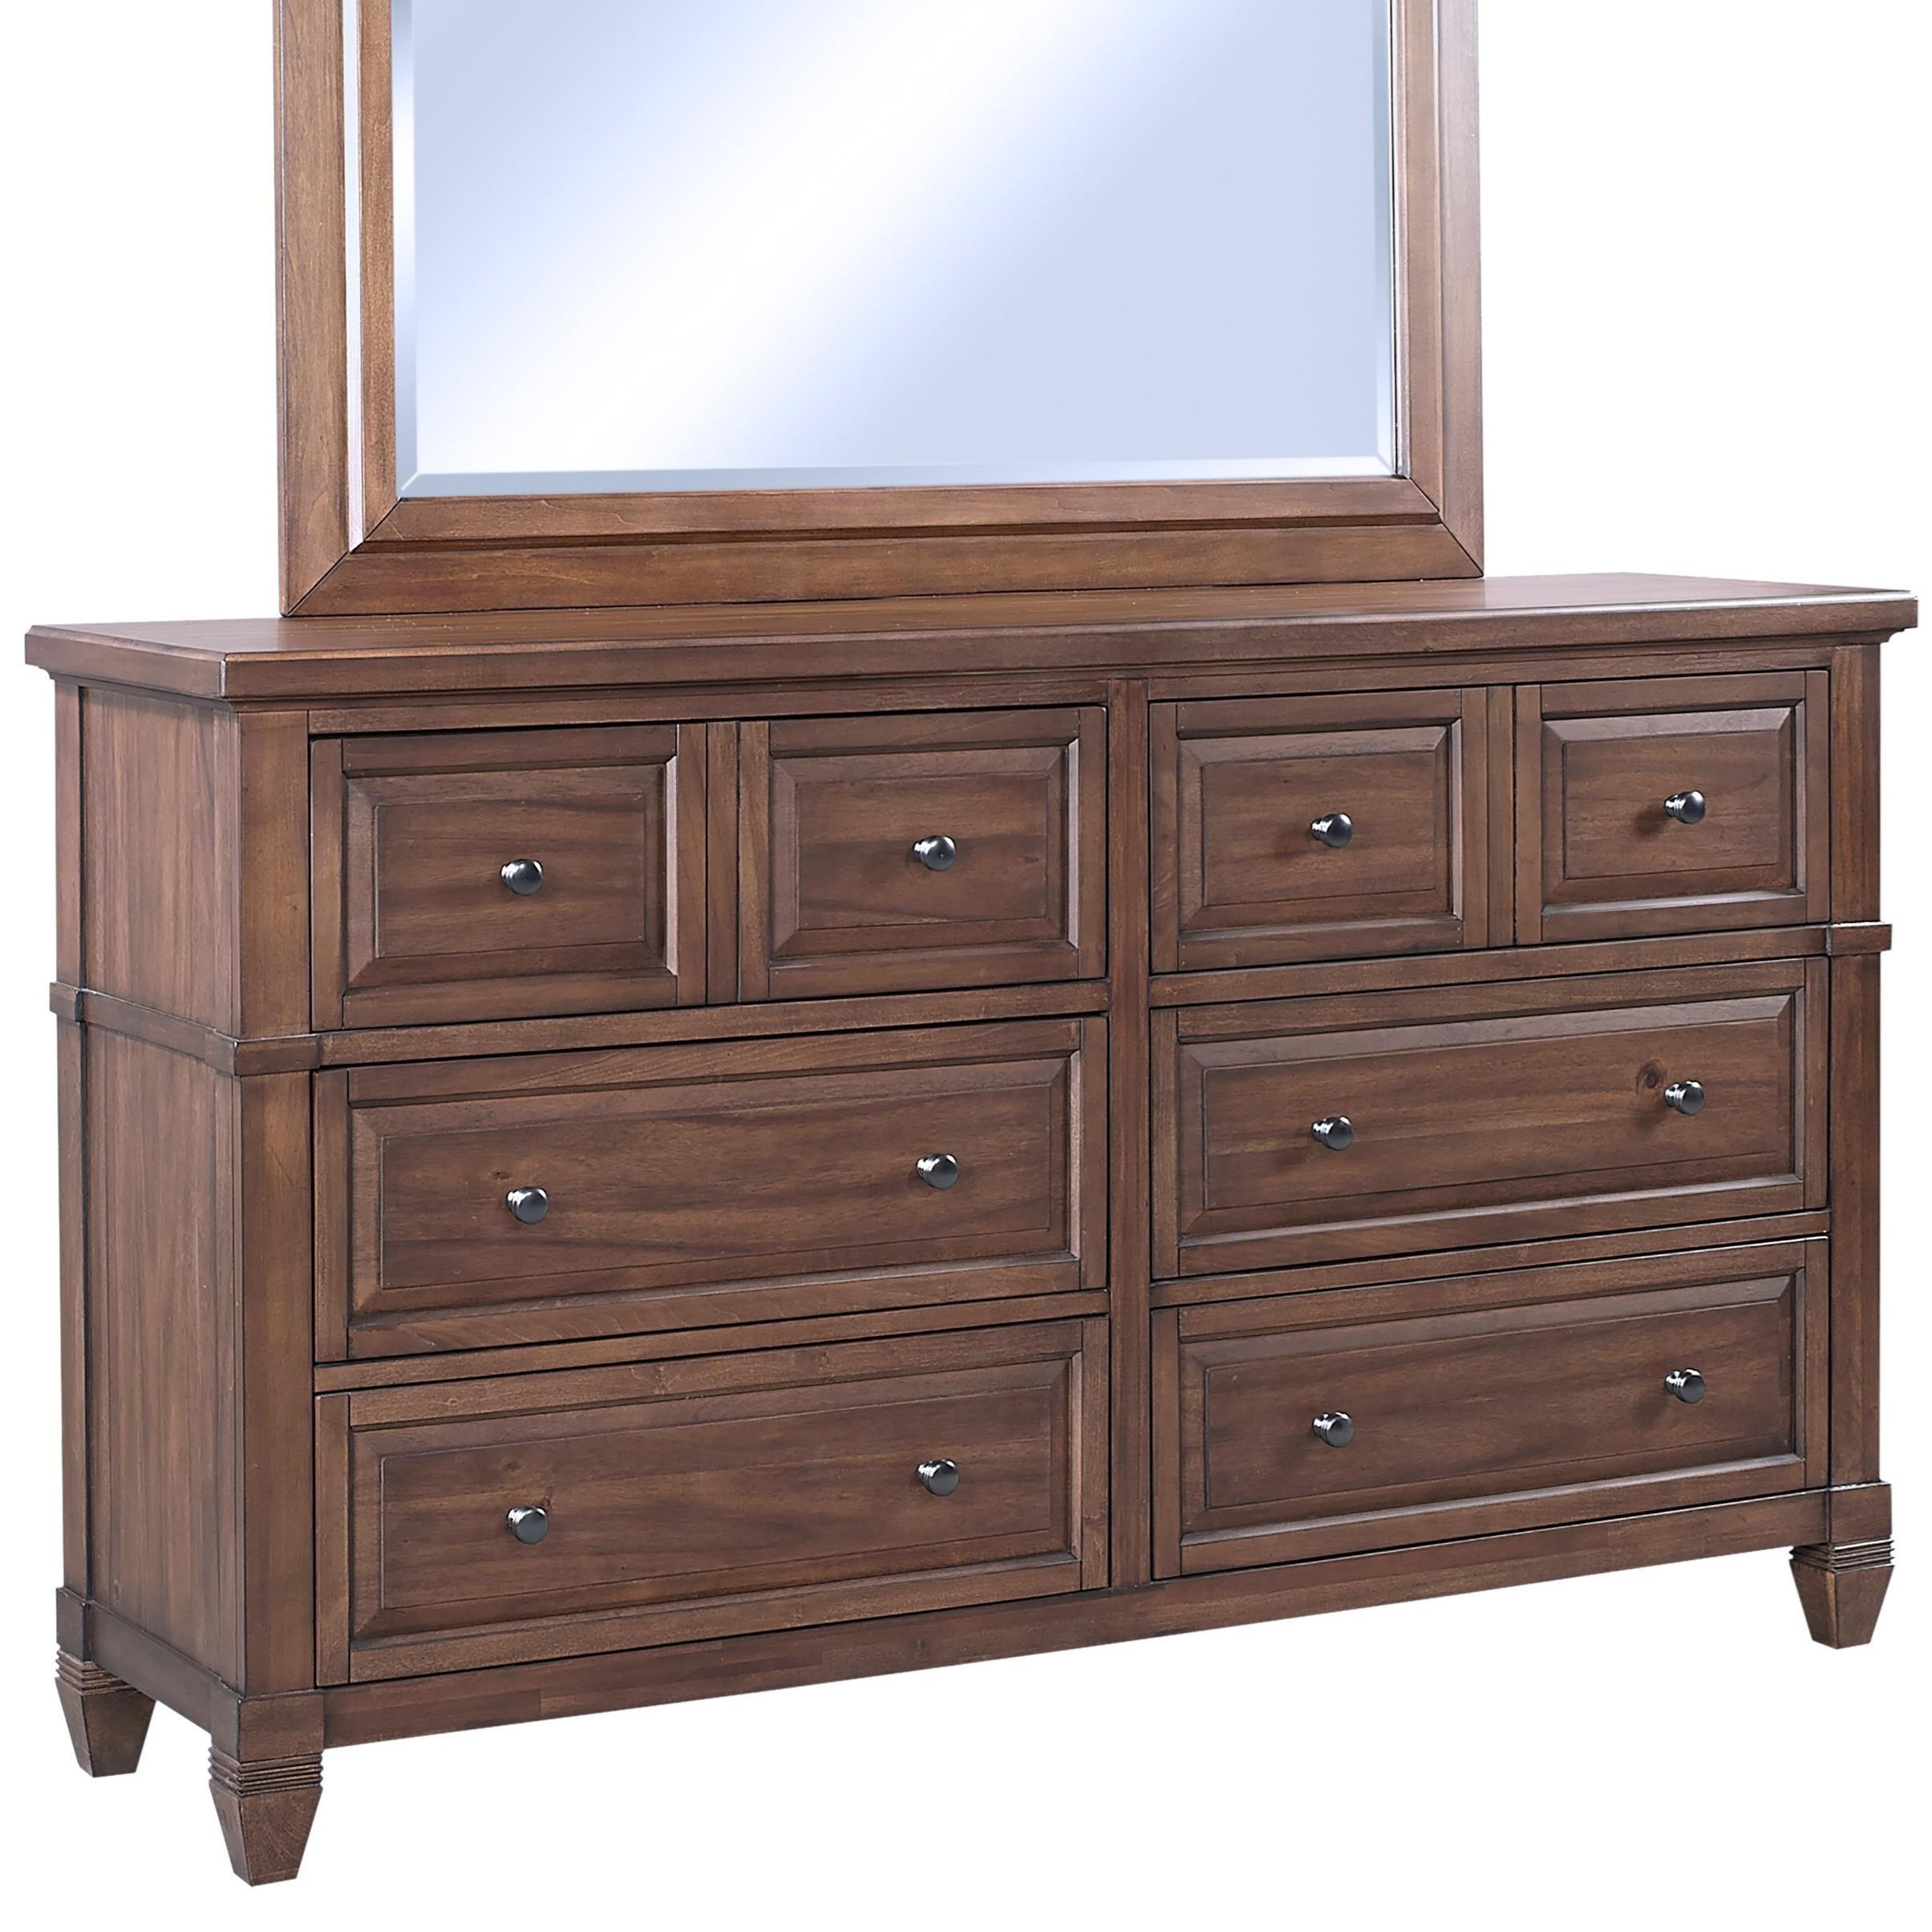 Transitional Six Drawer Dresser with Jewelry Storage